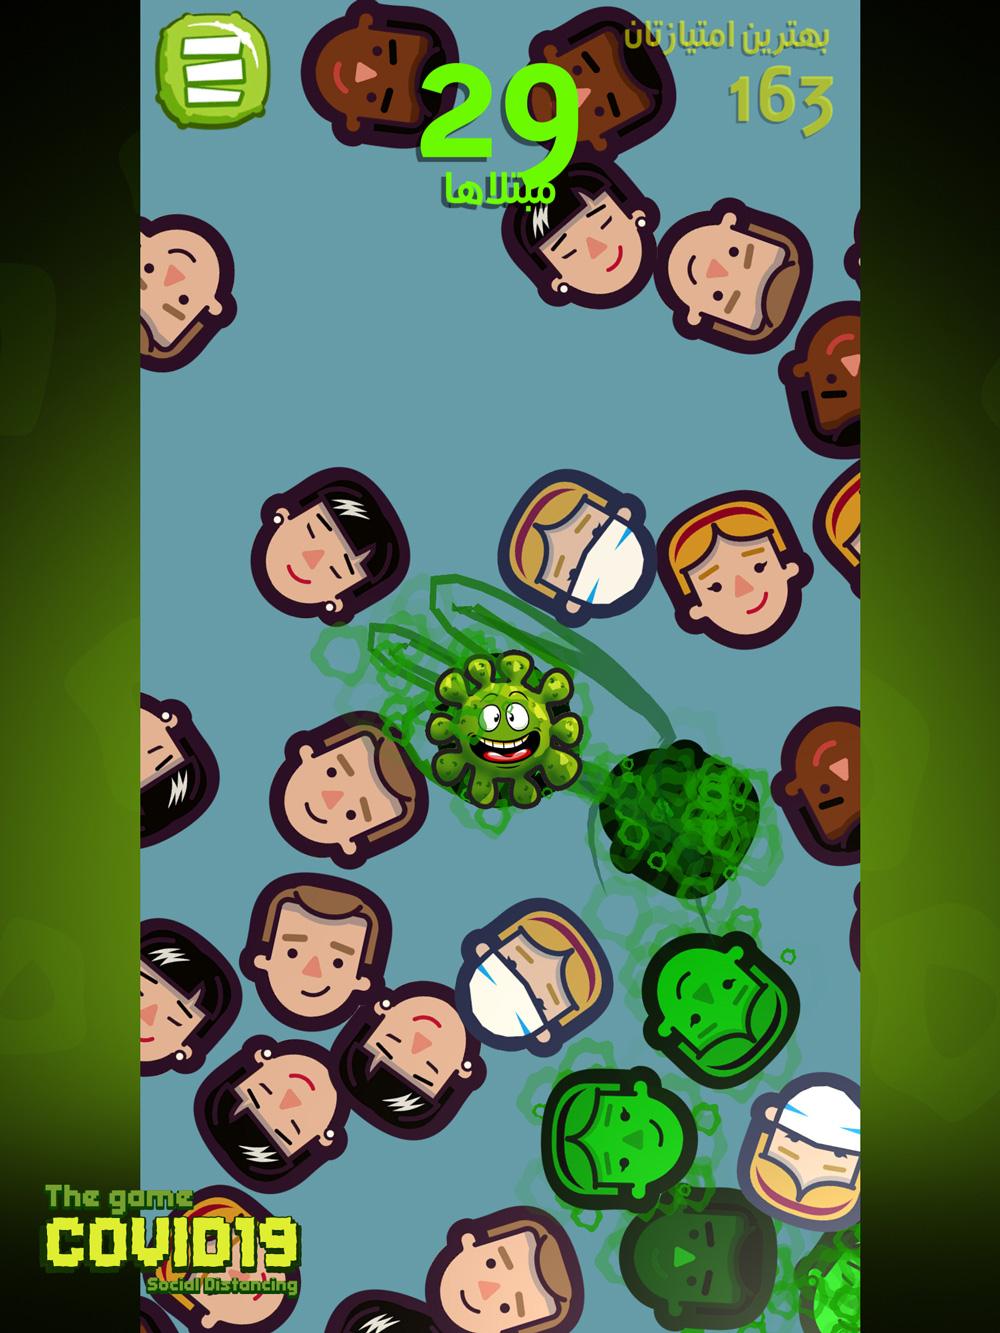 Covid 19 mobile game